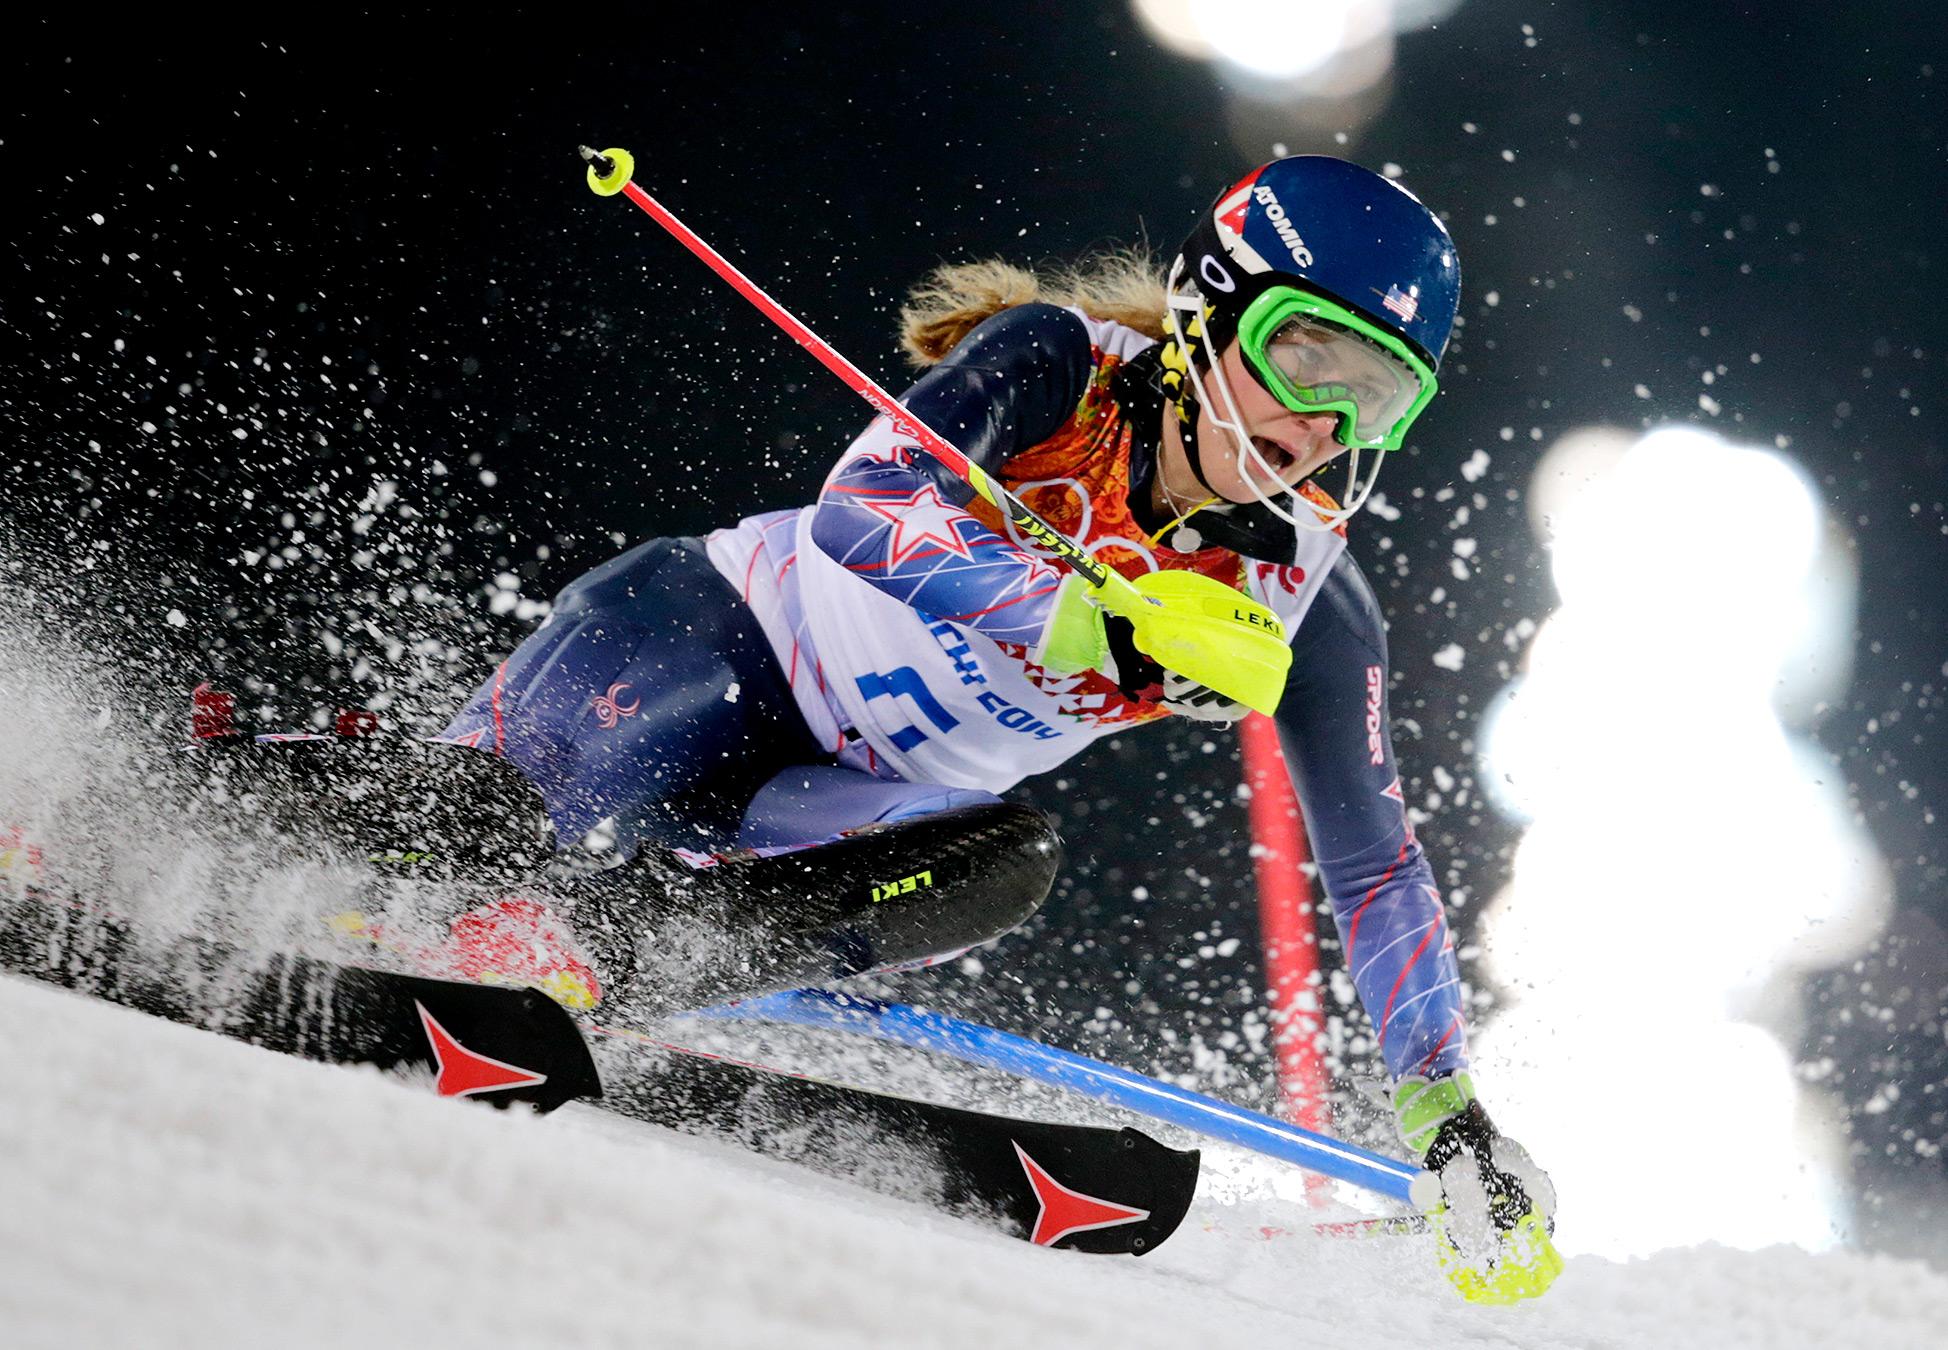 Alpine Skiing - Women's Slalom